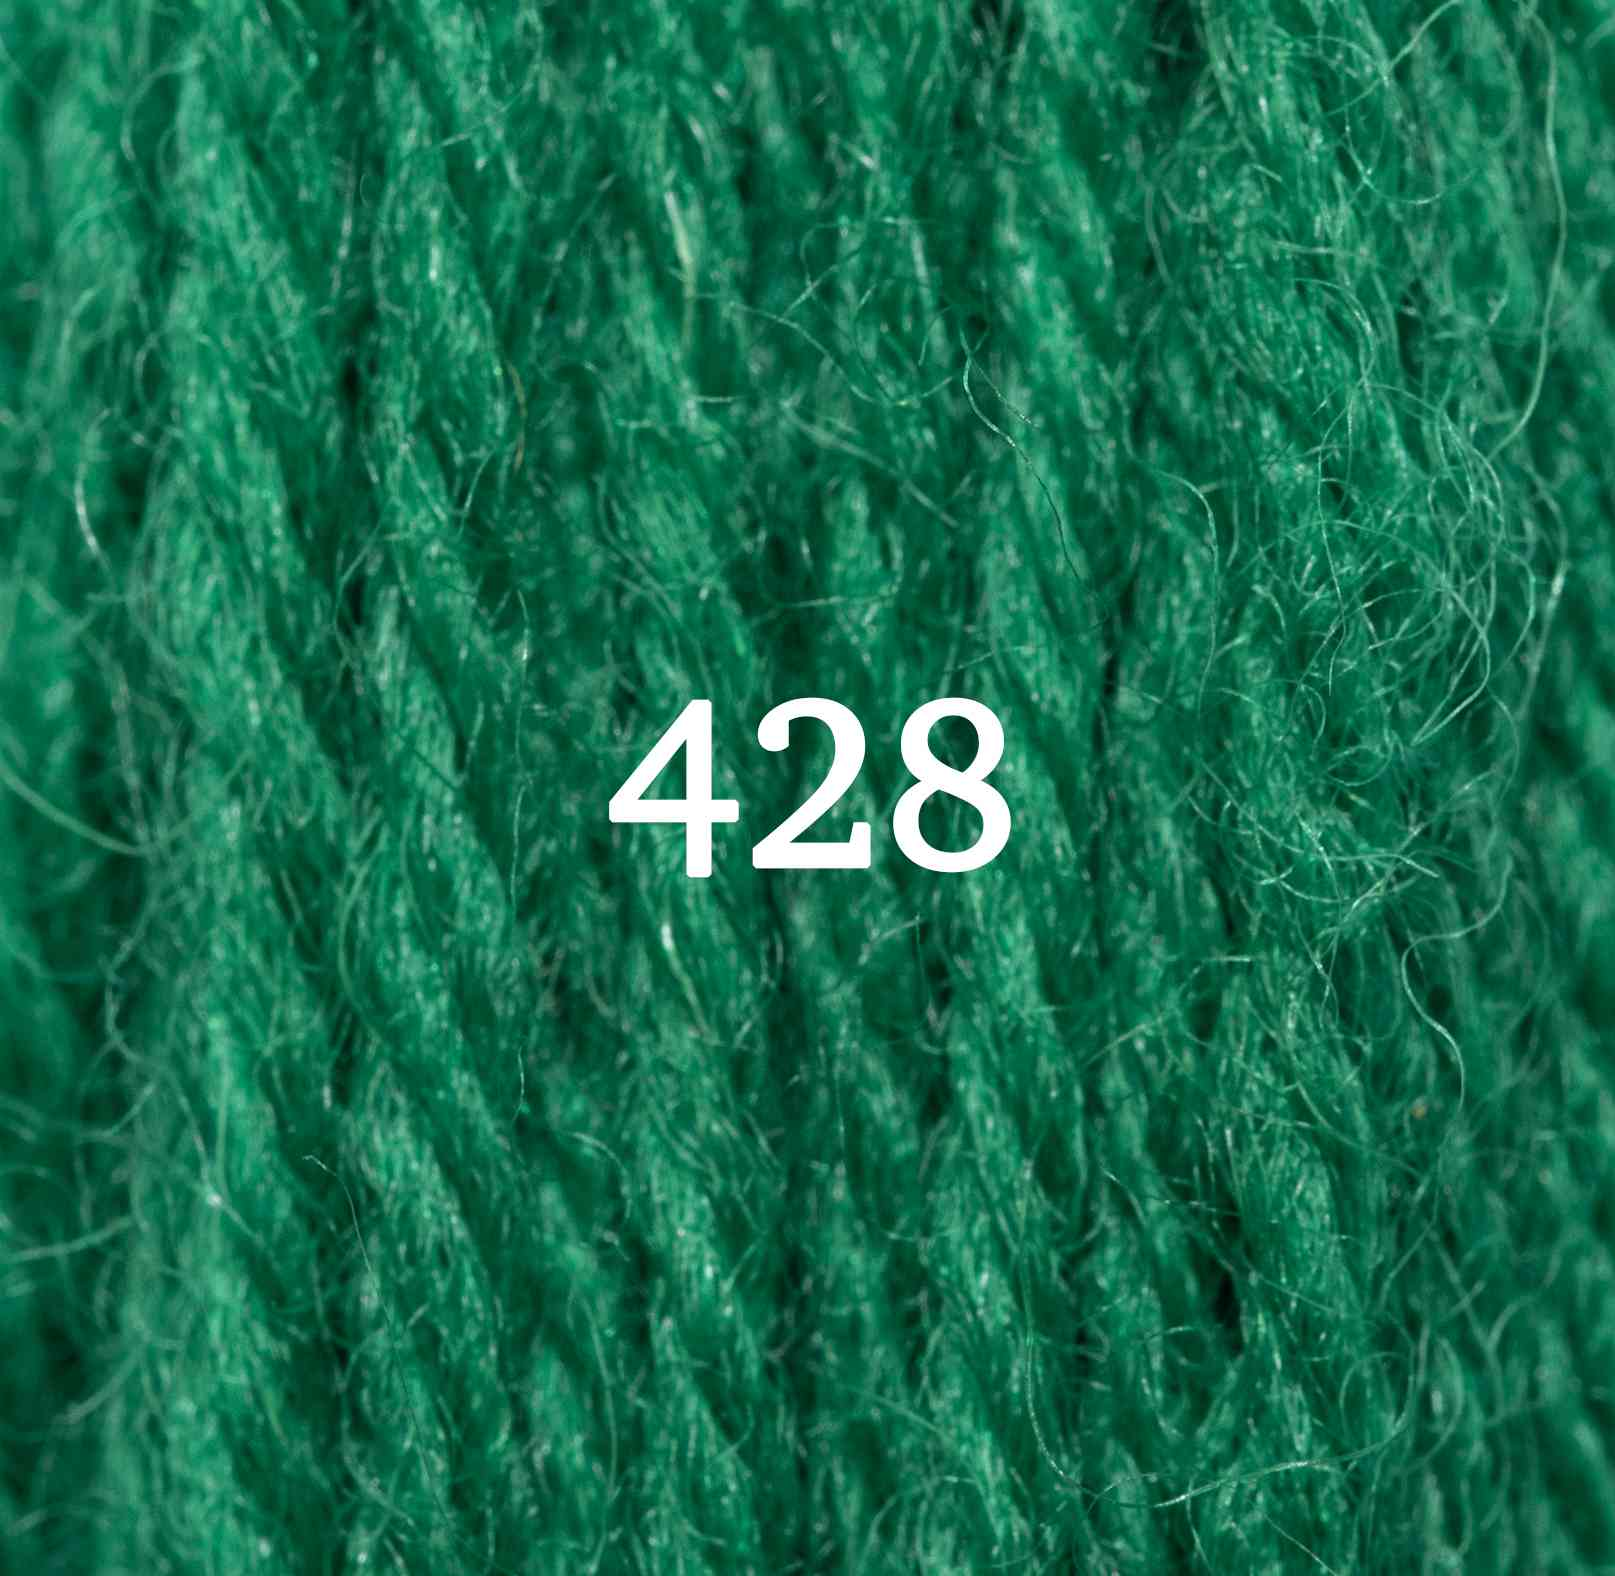 Leaf-Green-428